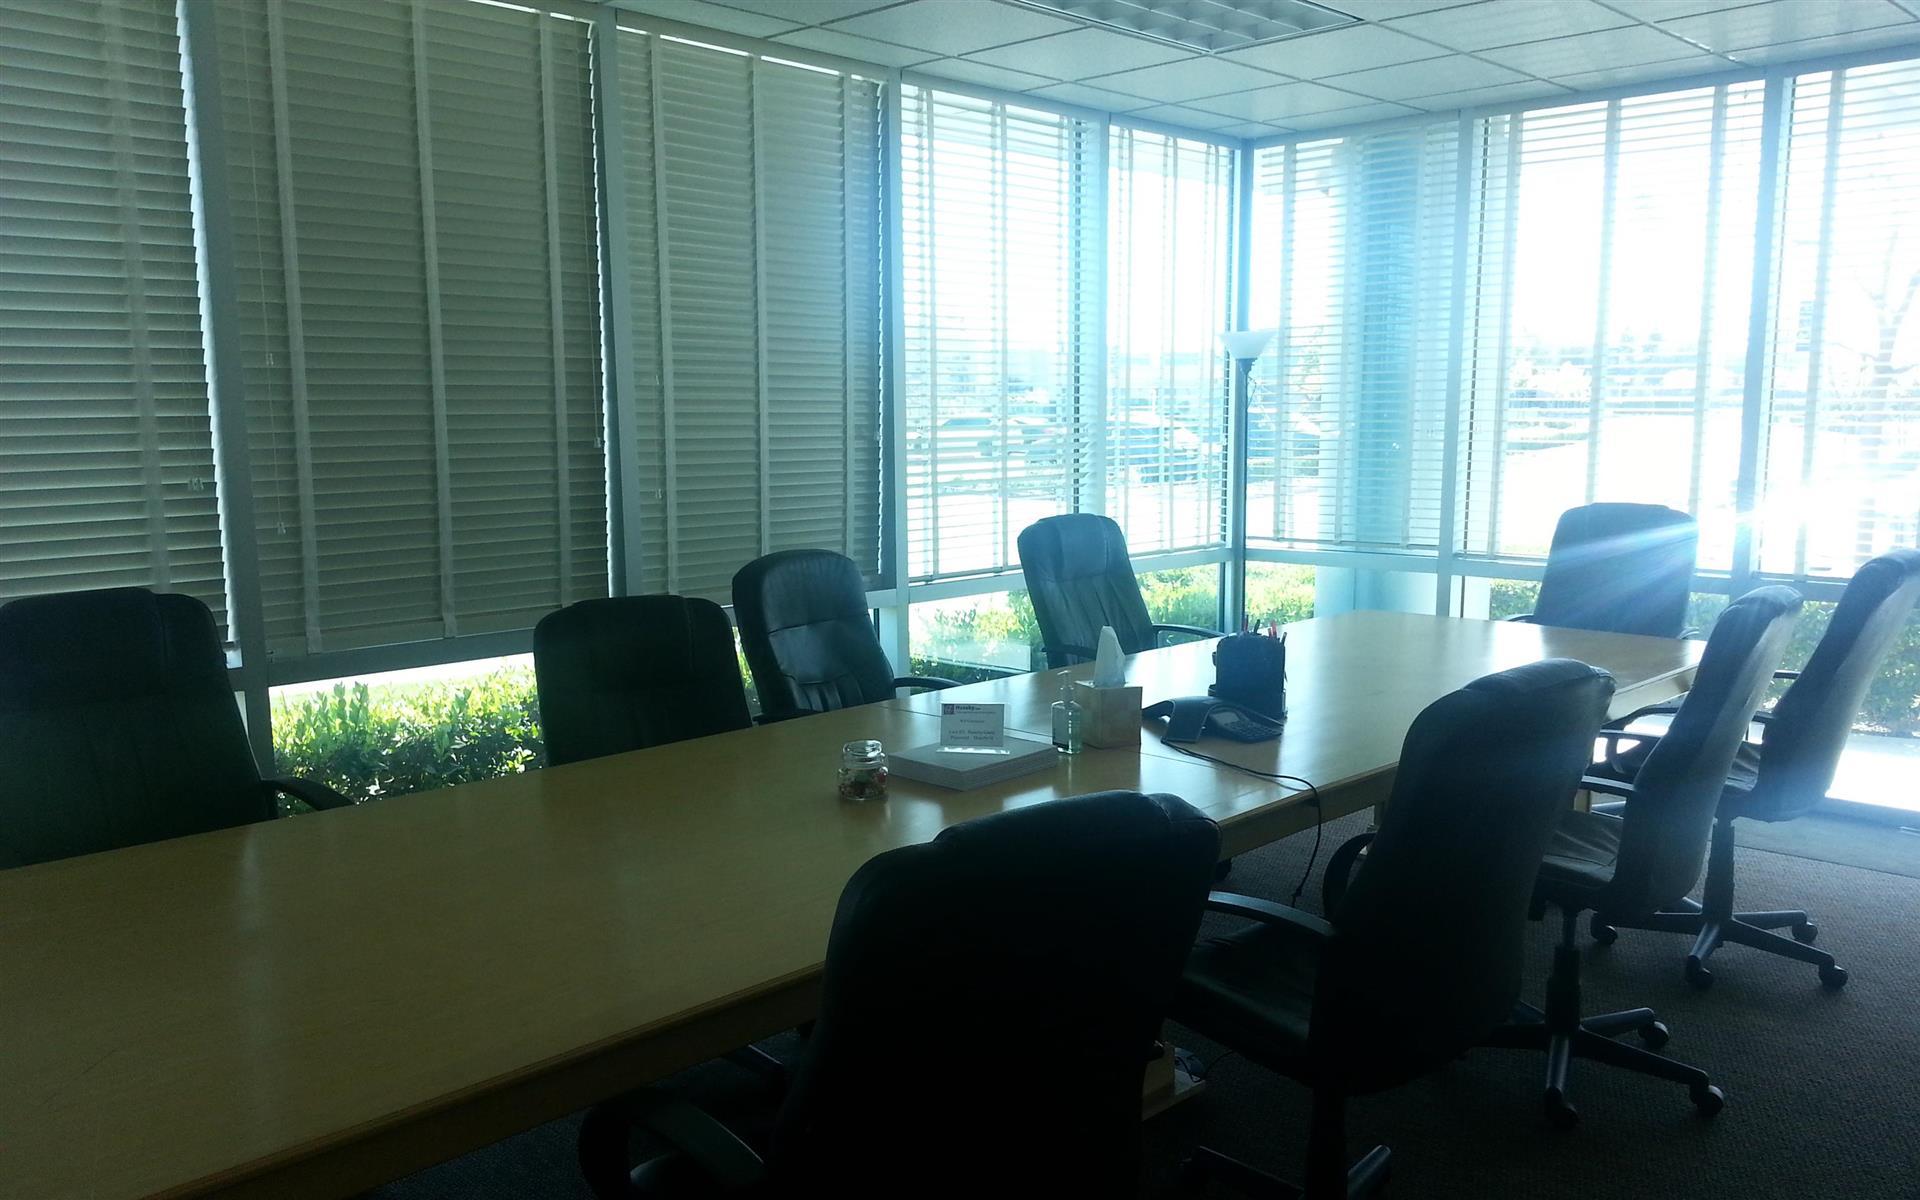 Huseby Inc. - Board Room Conference Room 5